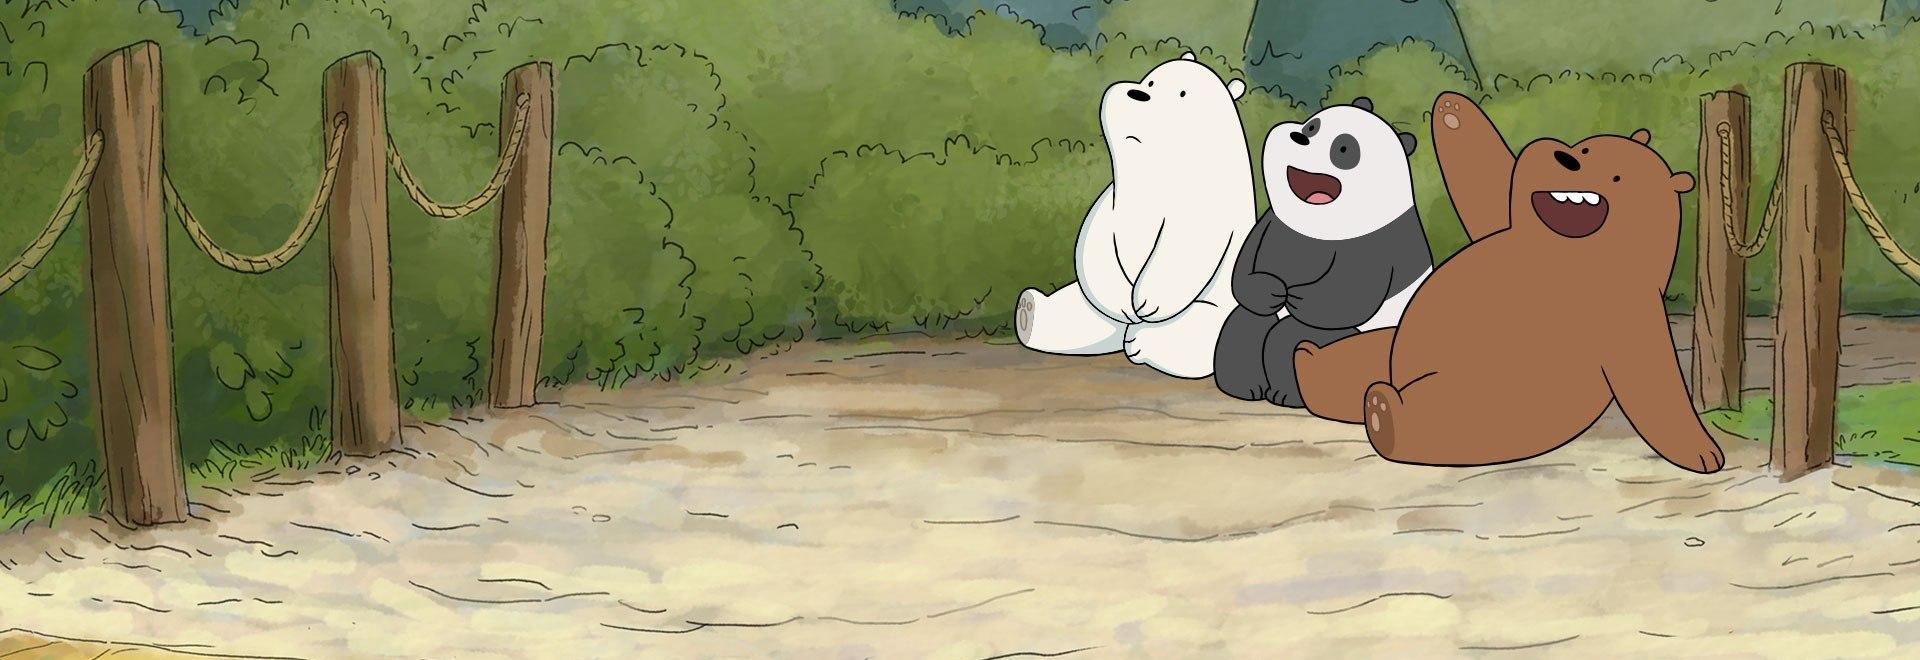 Io, orso bianco